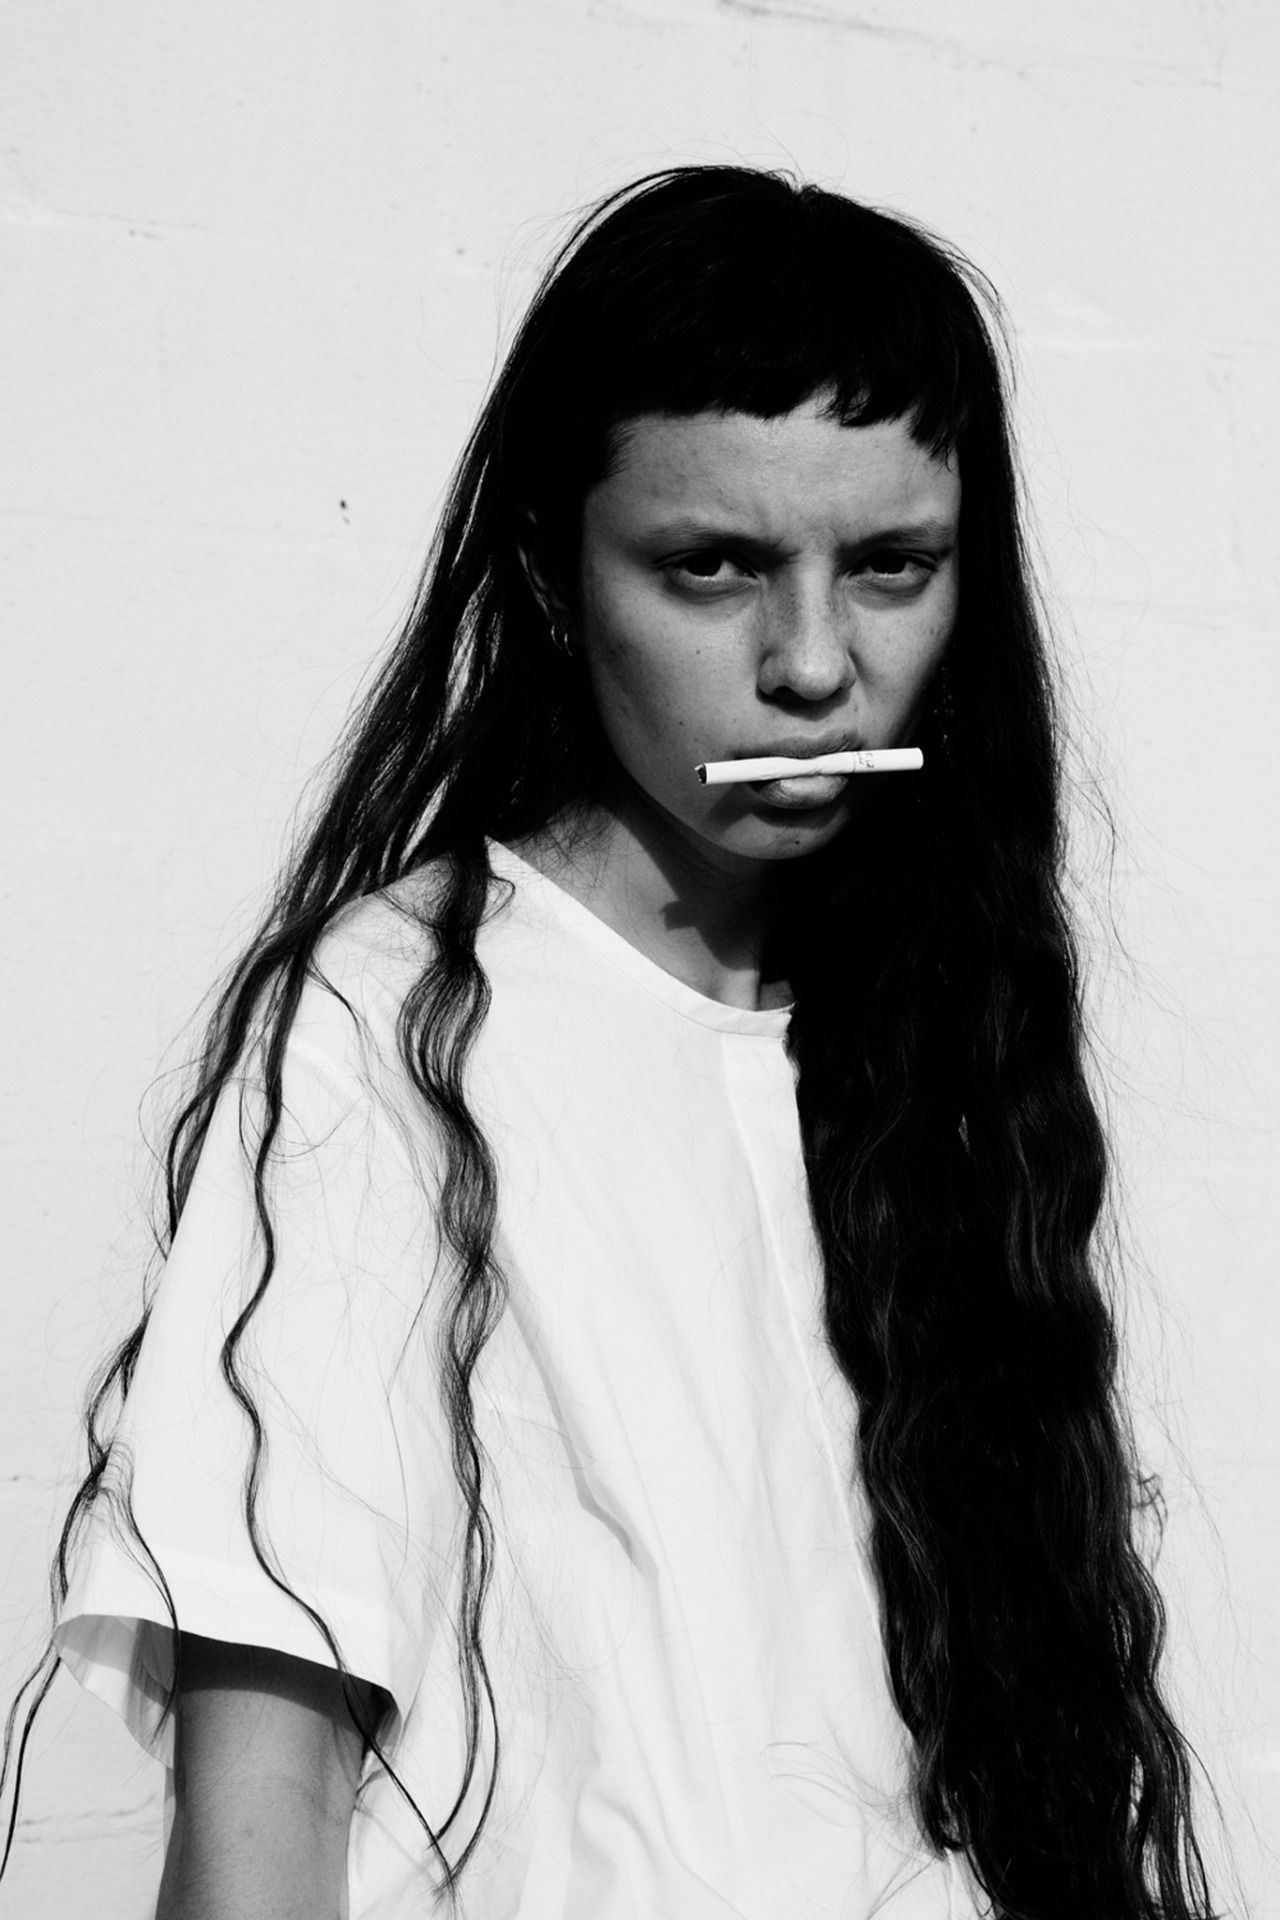 Pin von Morleigh auf Hair makeup nails   Porträt ideen ...